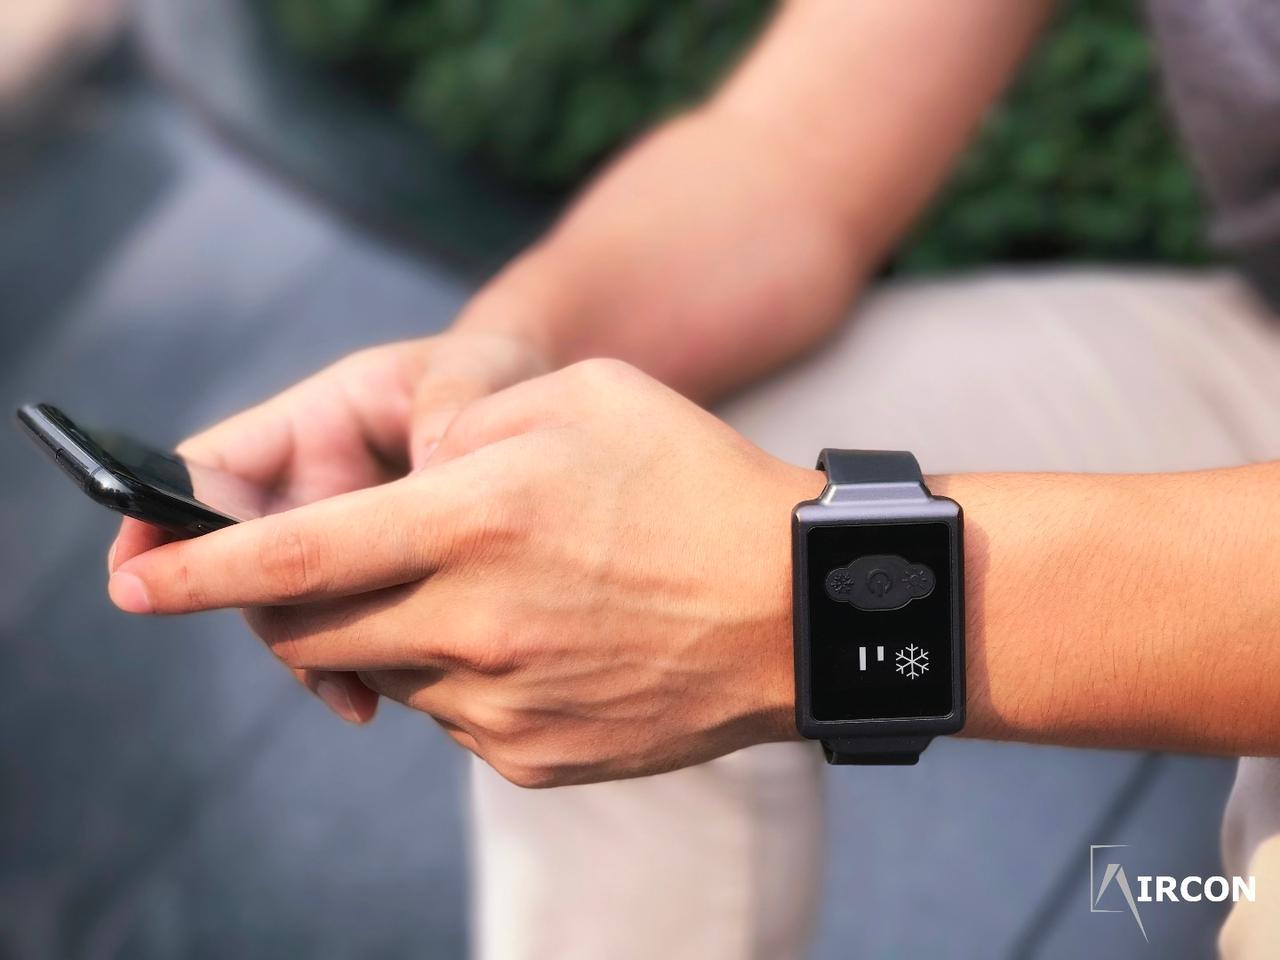 The Aircon Watch runs on a 400-mAh battery